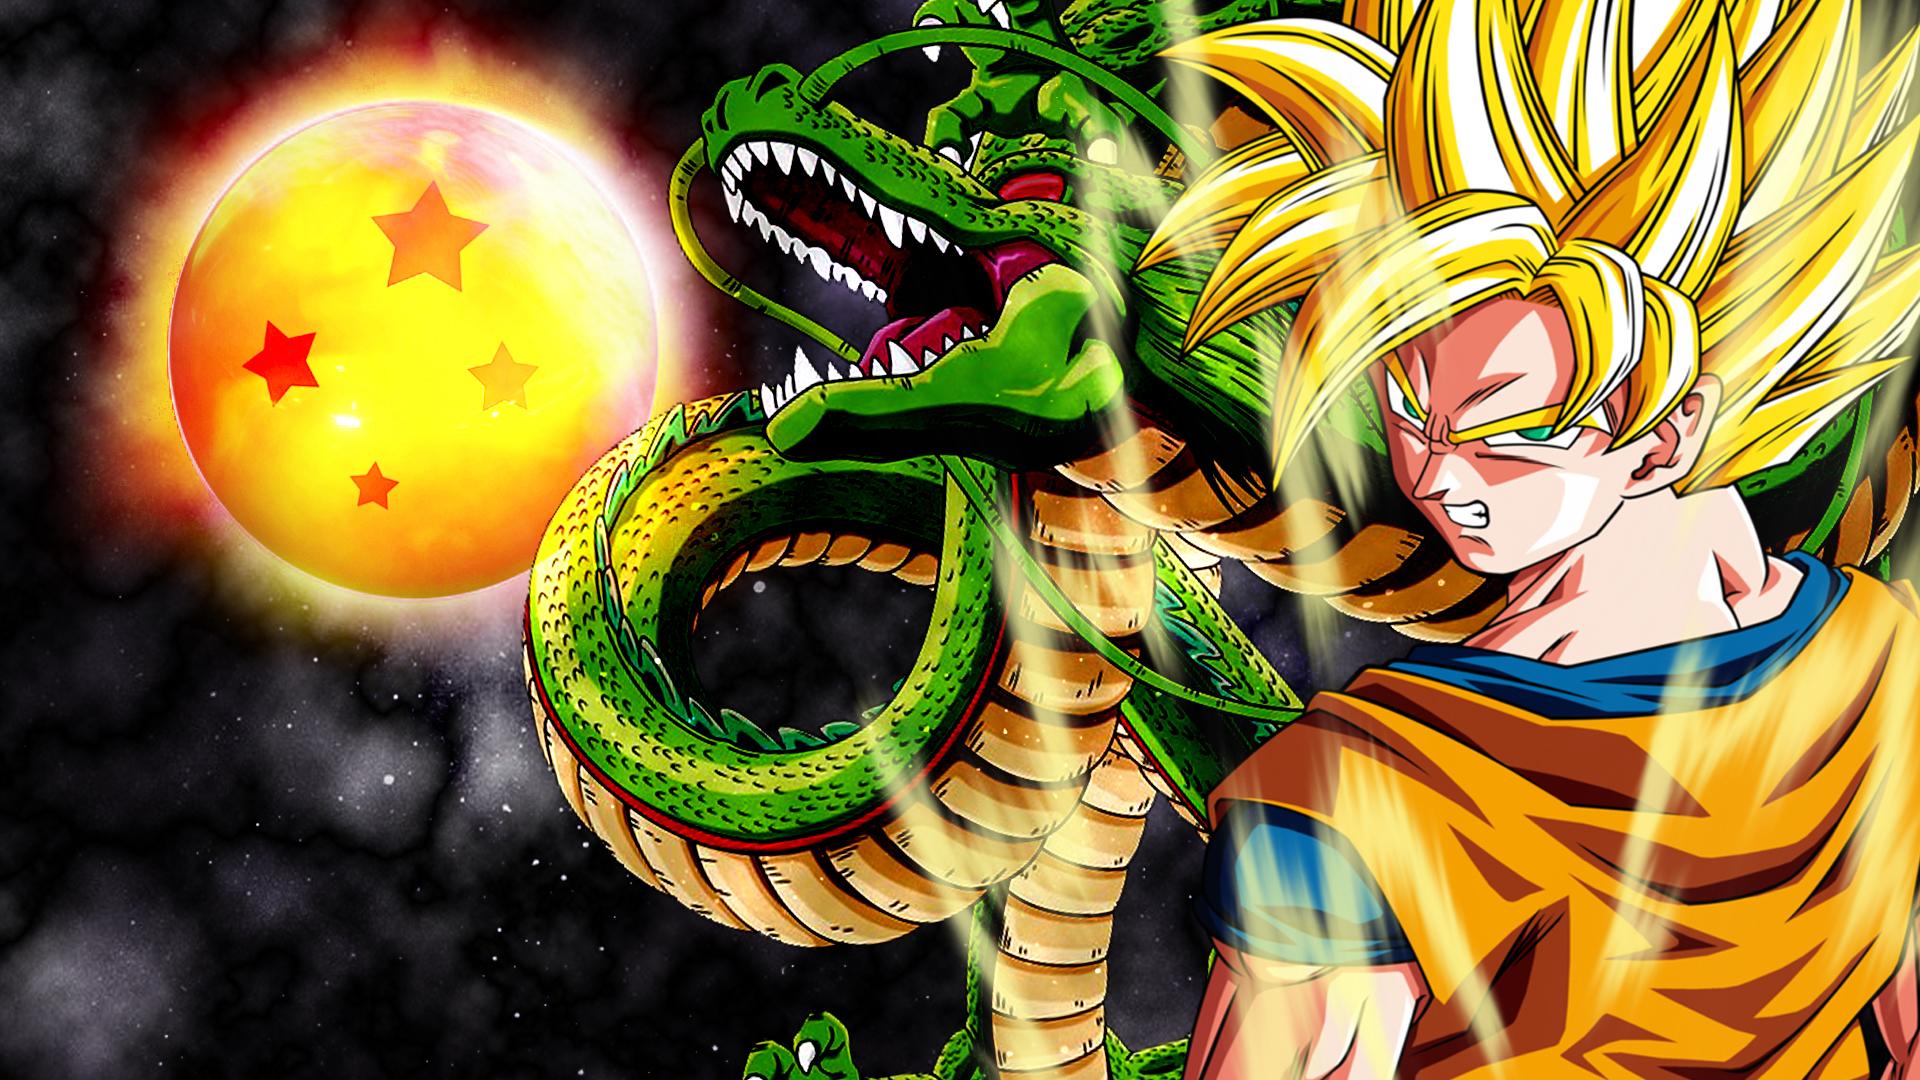 Download Goku Dragon Ball Z Backgrounds 1920x1080